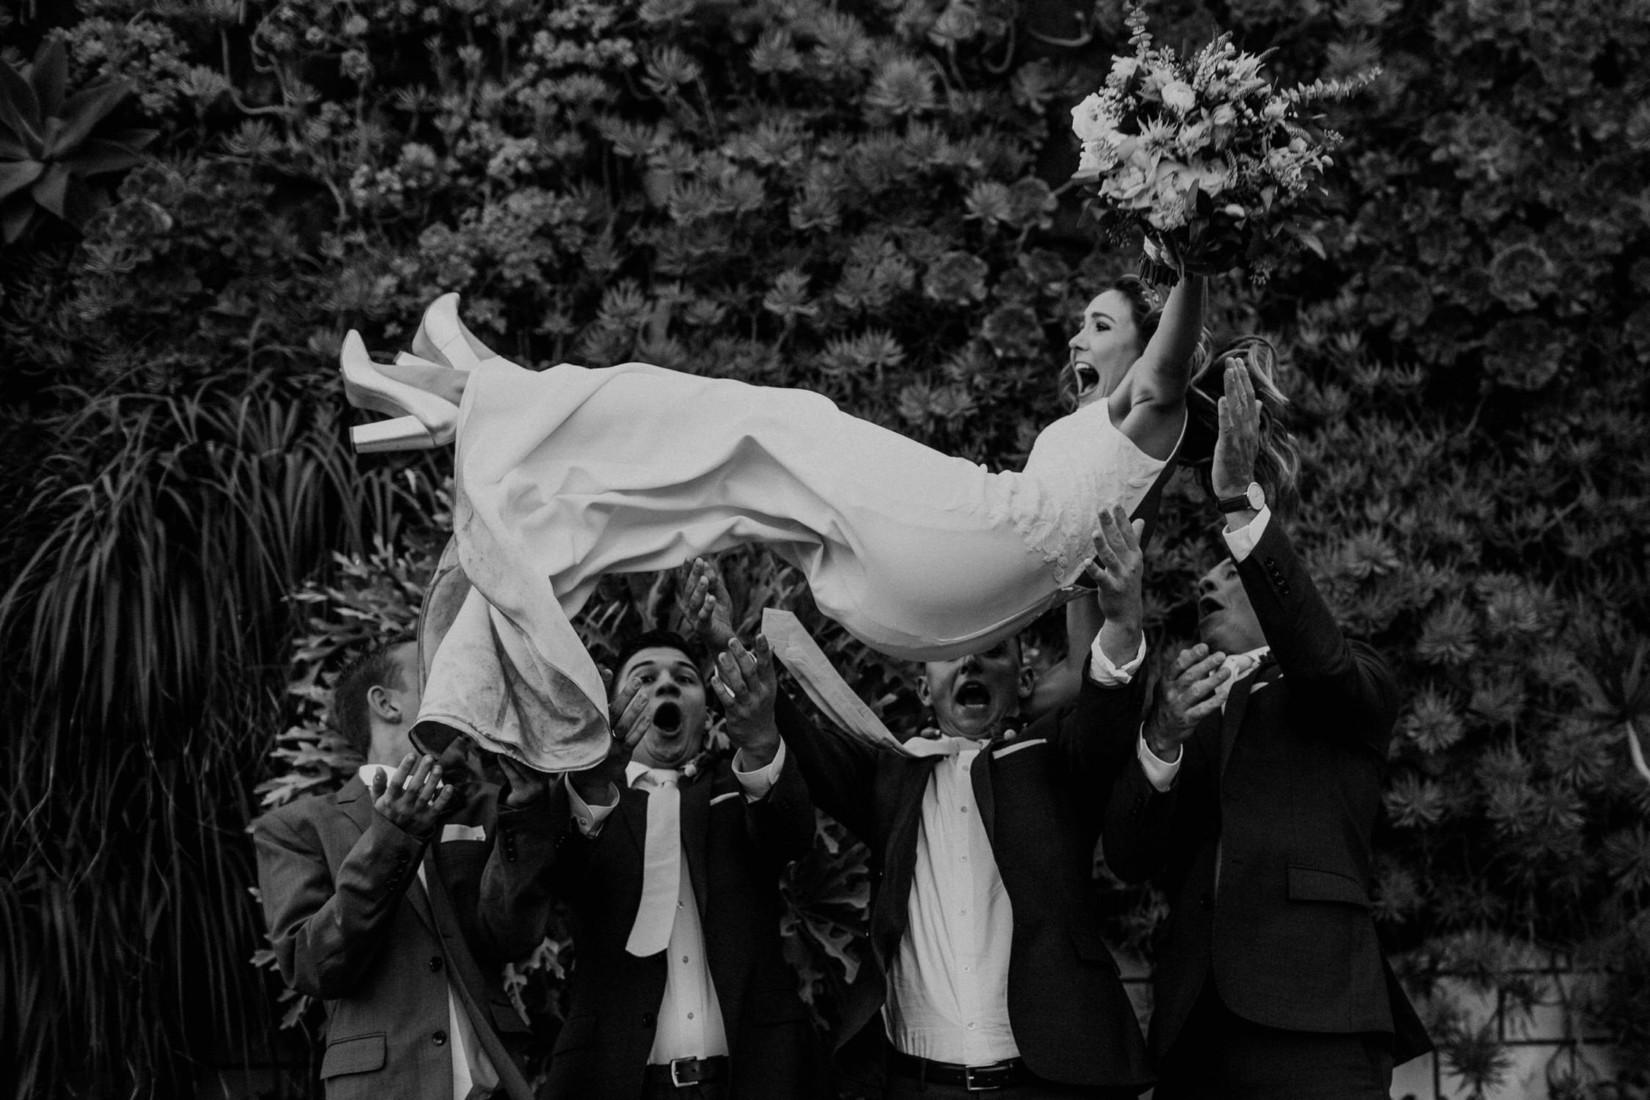 northwest_arkansas_wedding_photographer_unique_0033-1650x1100.jpg